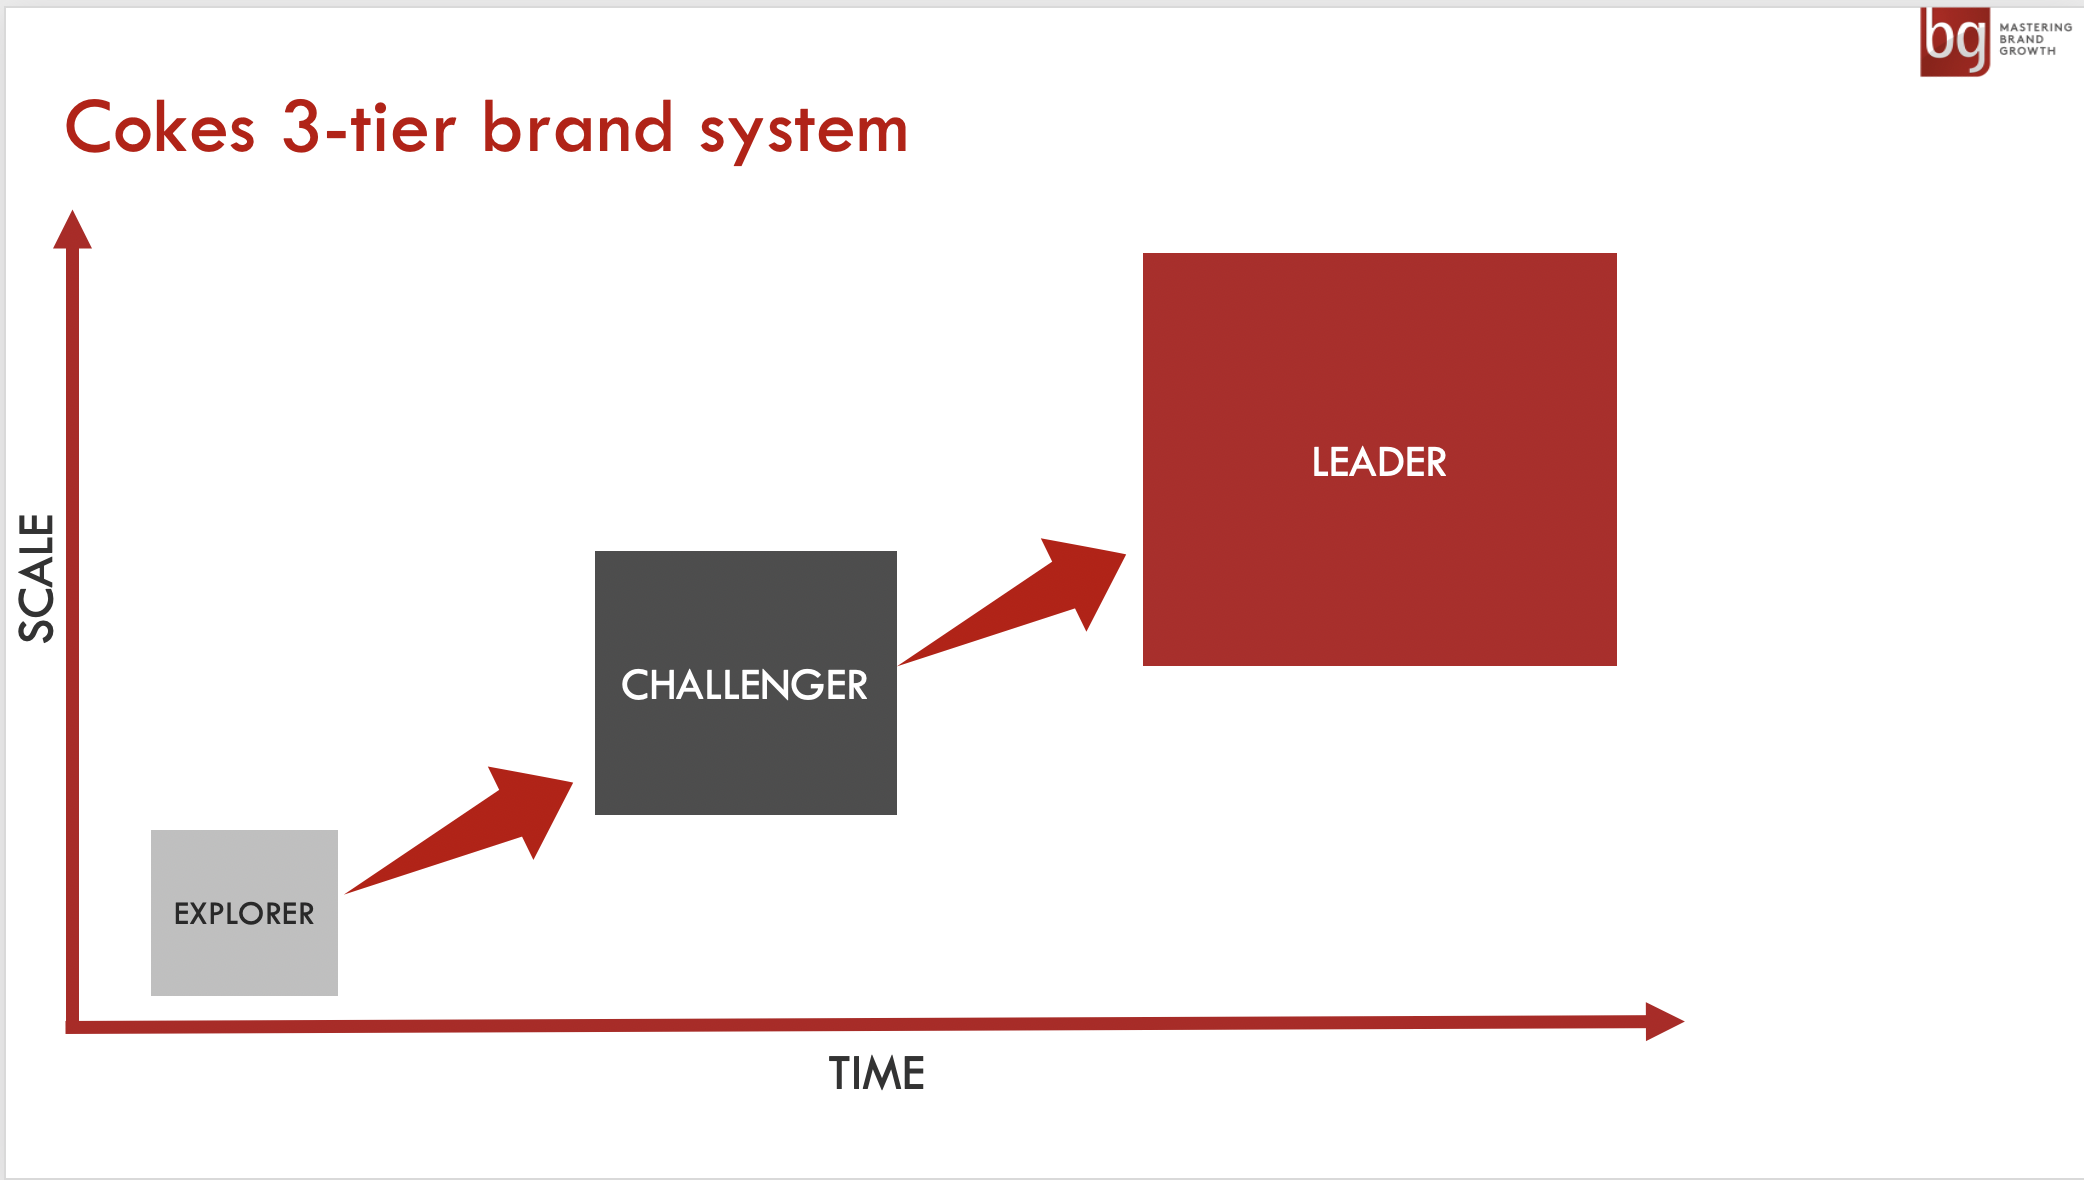 Coca-Cola's 3-tier brand system